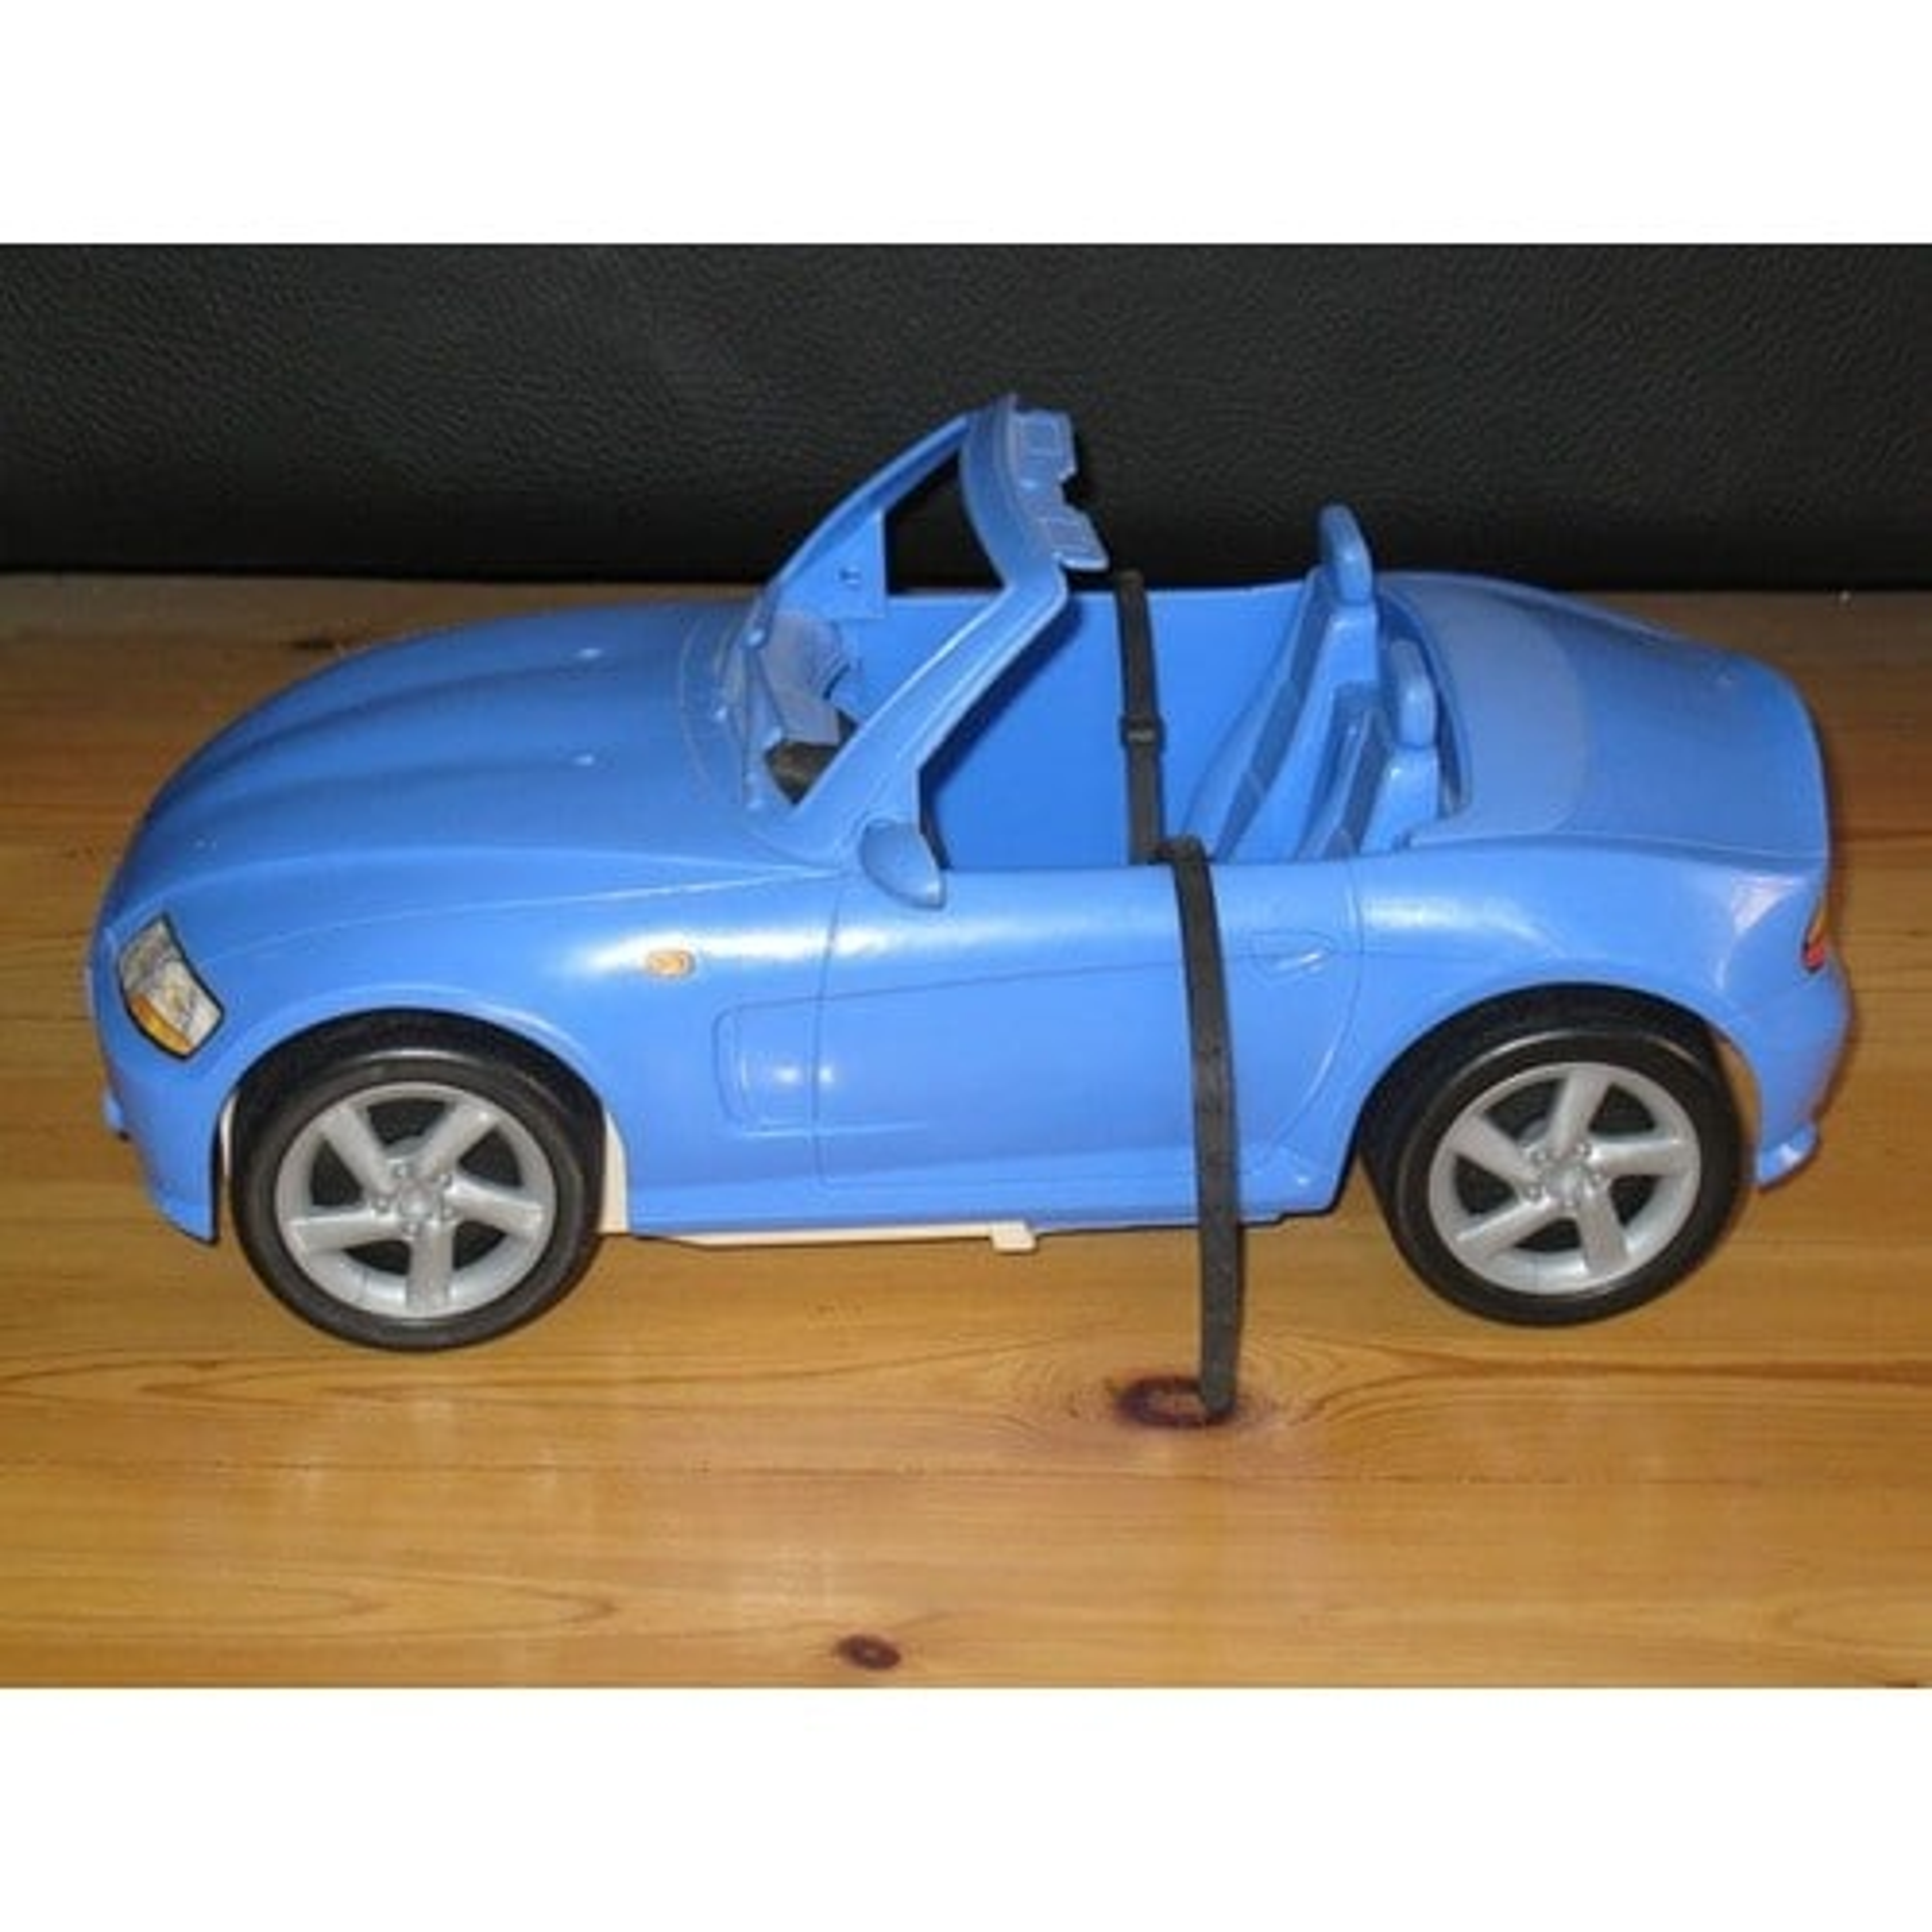 voiture bleu barbie achat vente de jouet rakuten. Black Bedroom Furniture Sets. Home Design Ideas